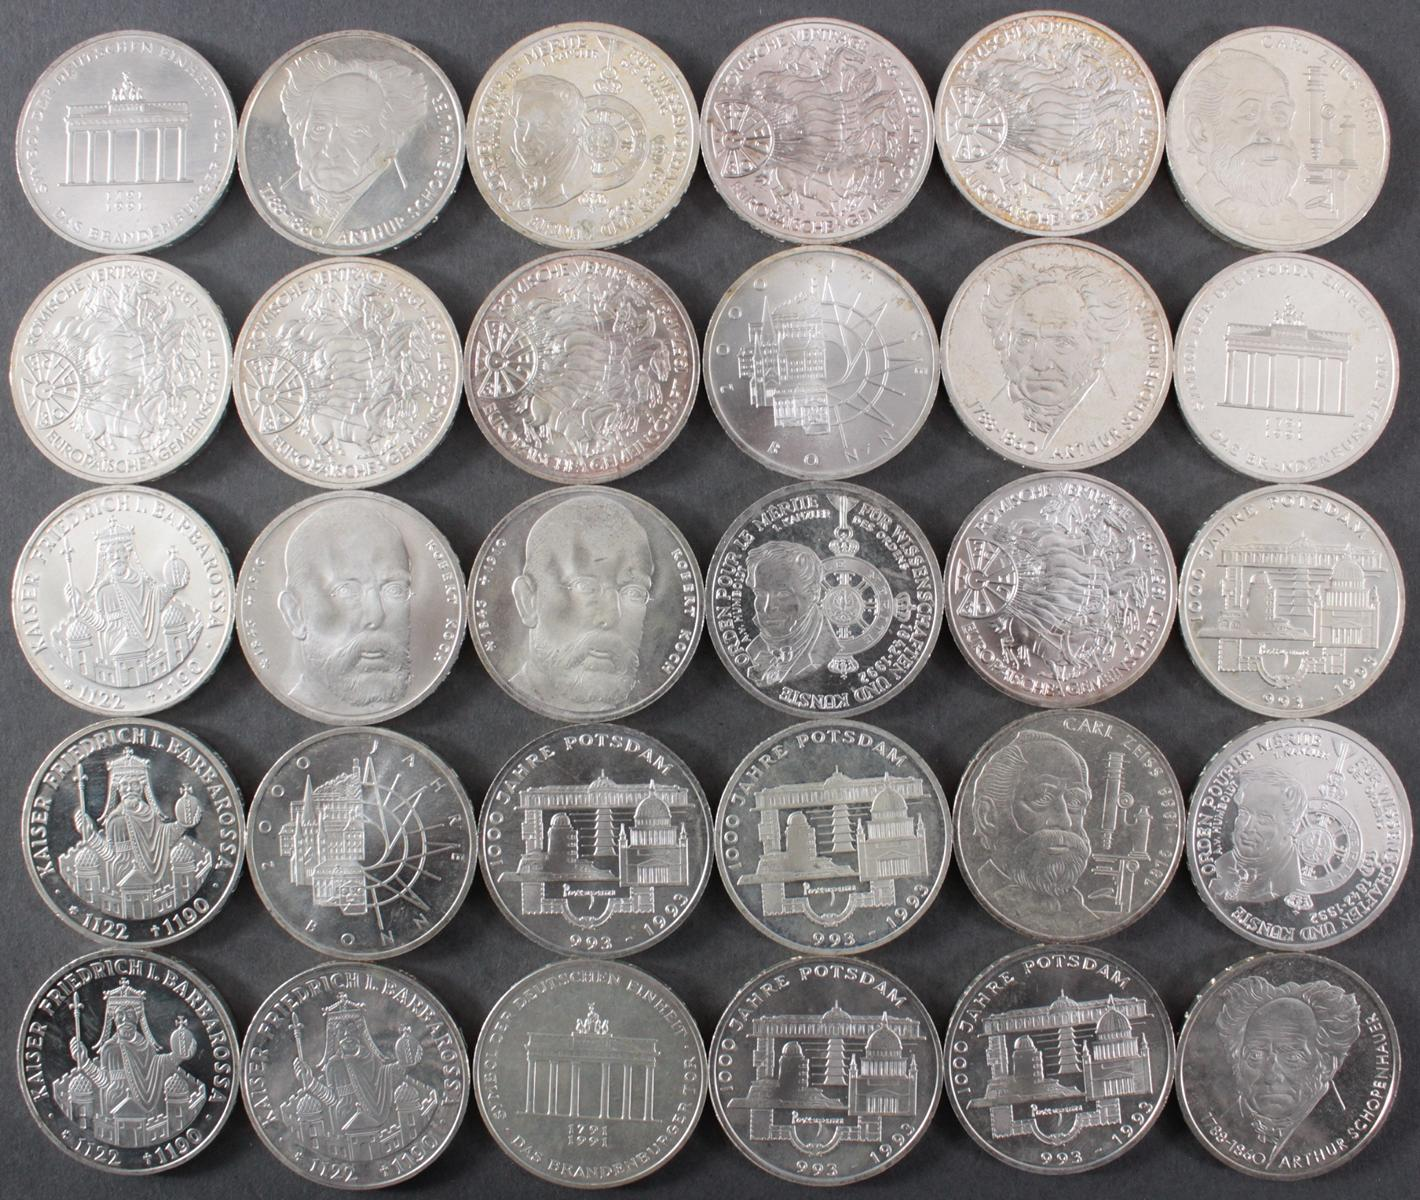 BRD, 10 DM Gedenkmünzen, 30 Stück